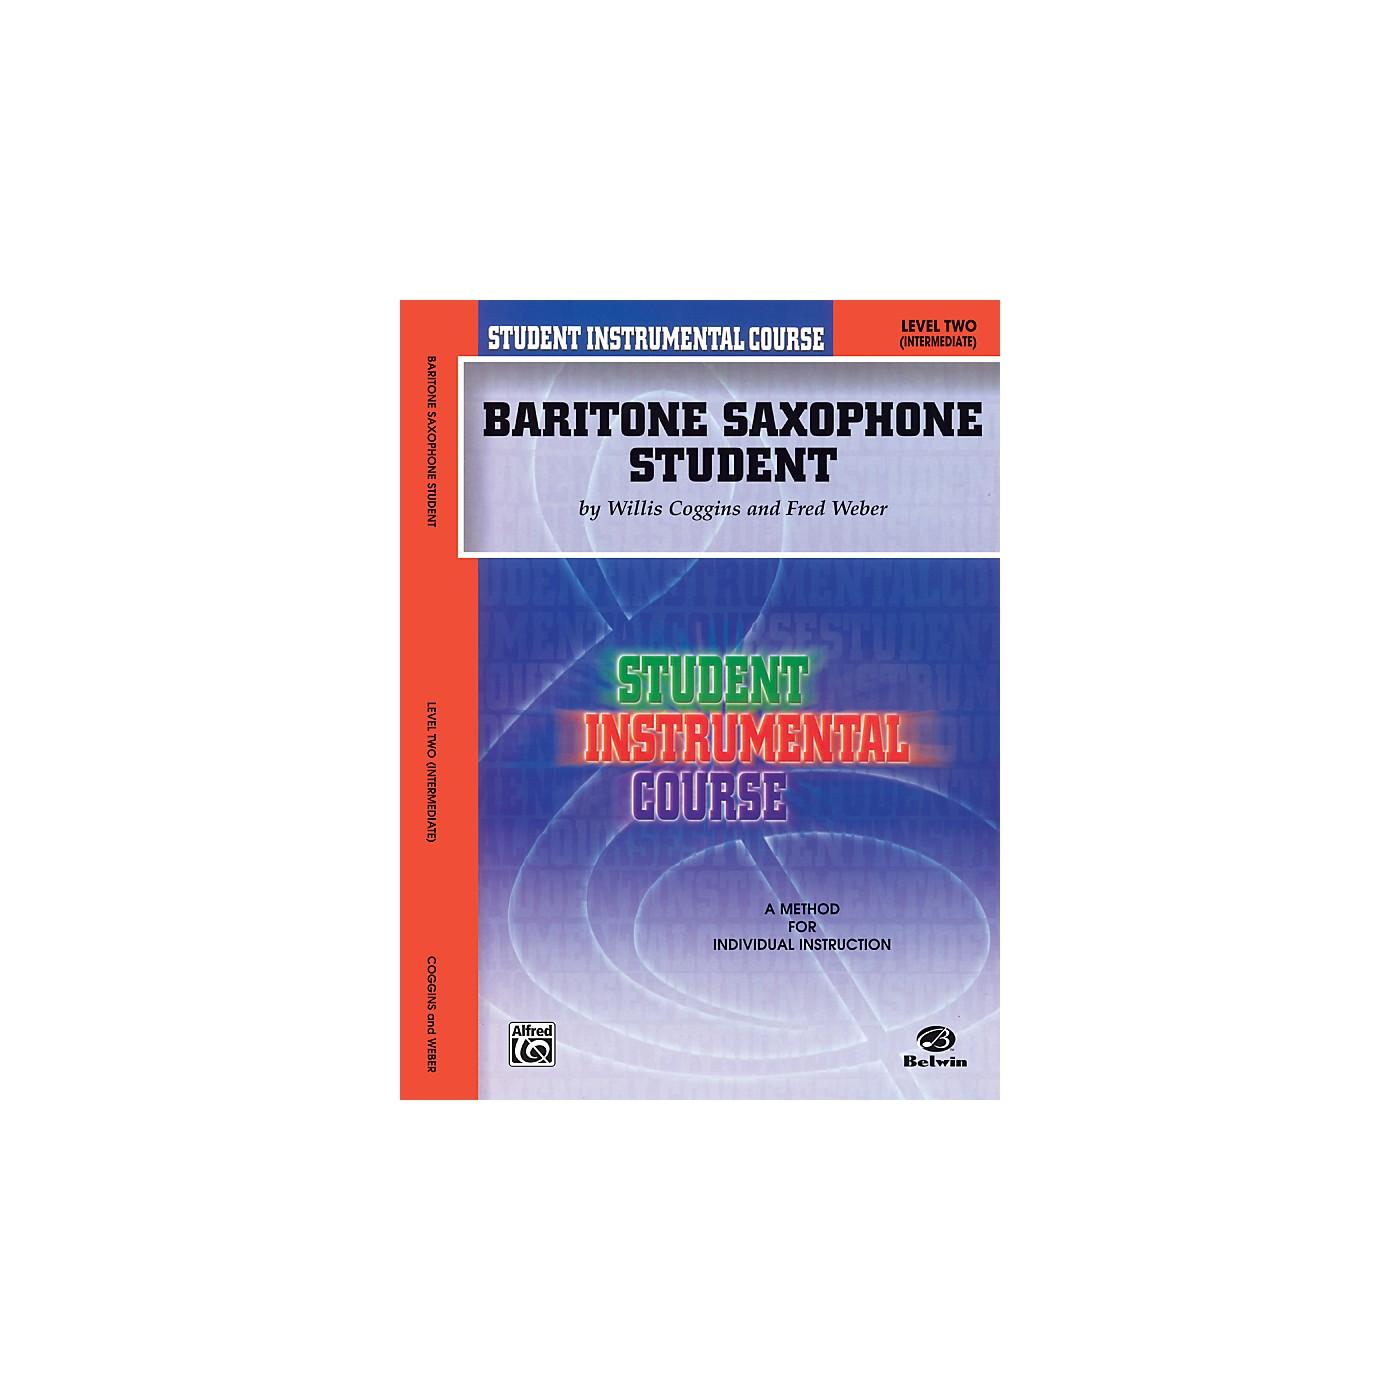 Alfred Student Instrumental Course Baritone Saxophone Student Level II thumbnail